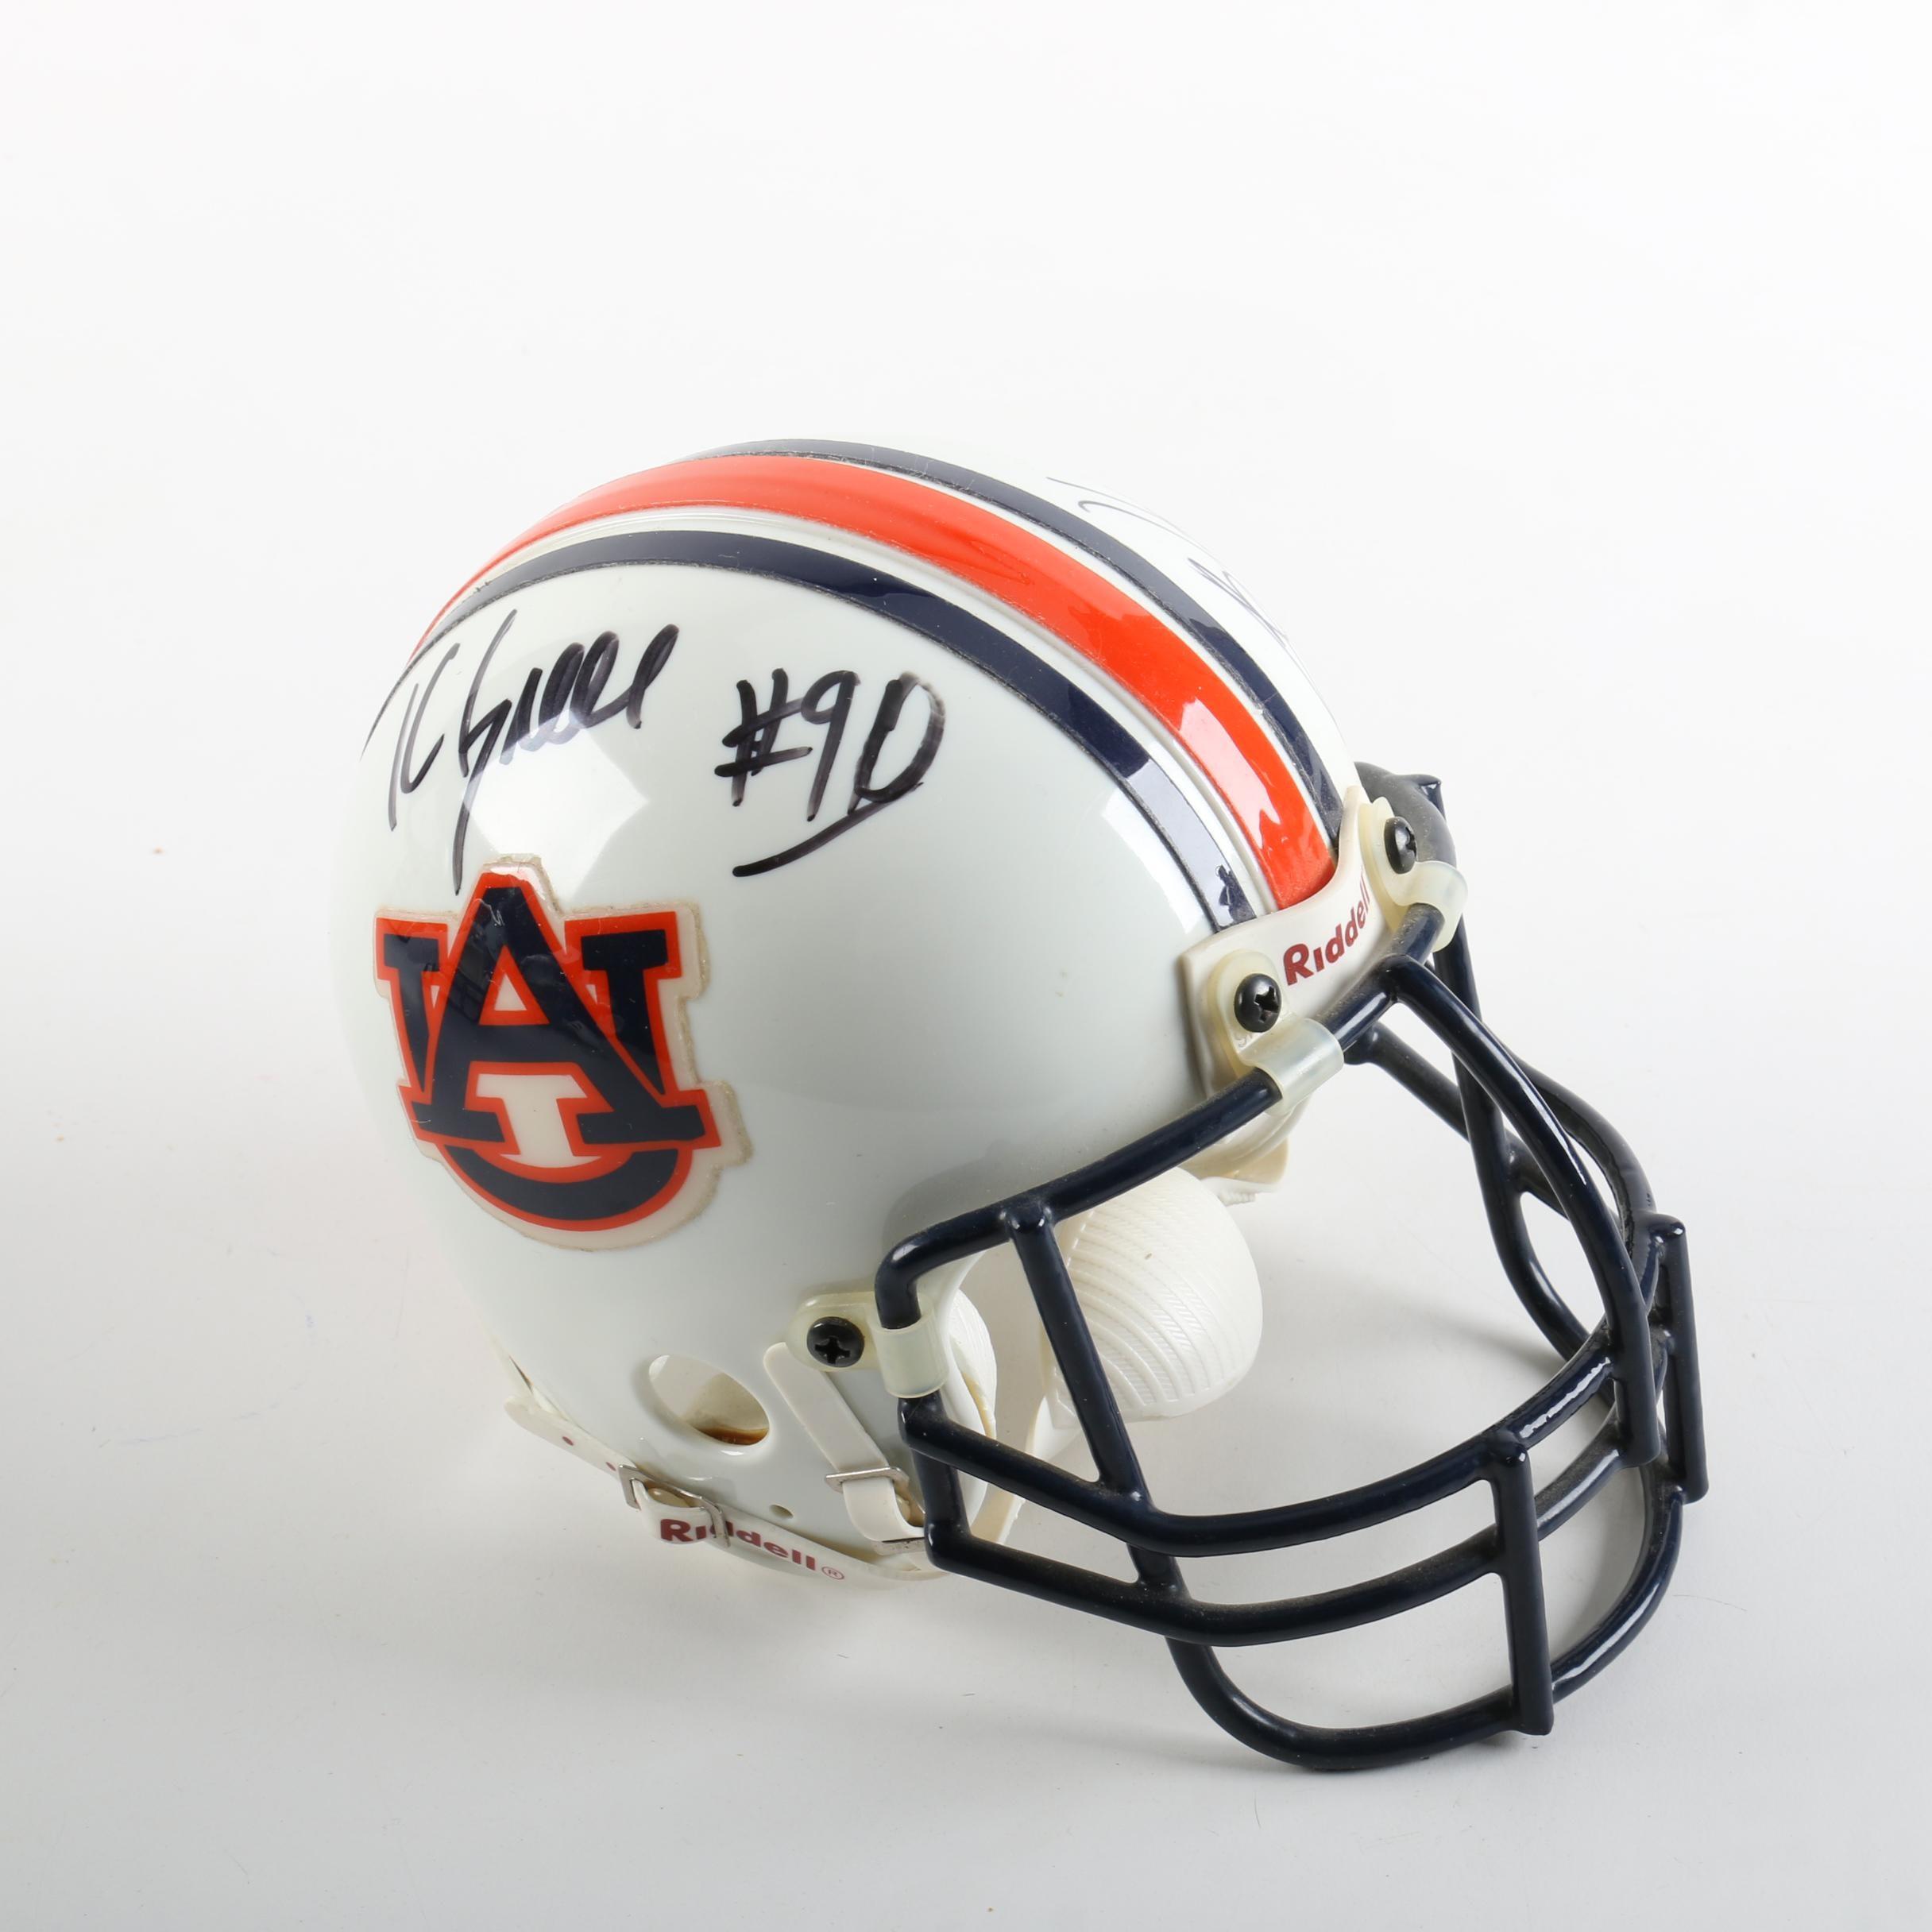 Kevin Greene, Bo Jackson, and Pat Washington Autographed Miniature Helmet